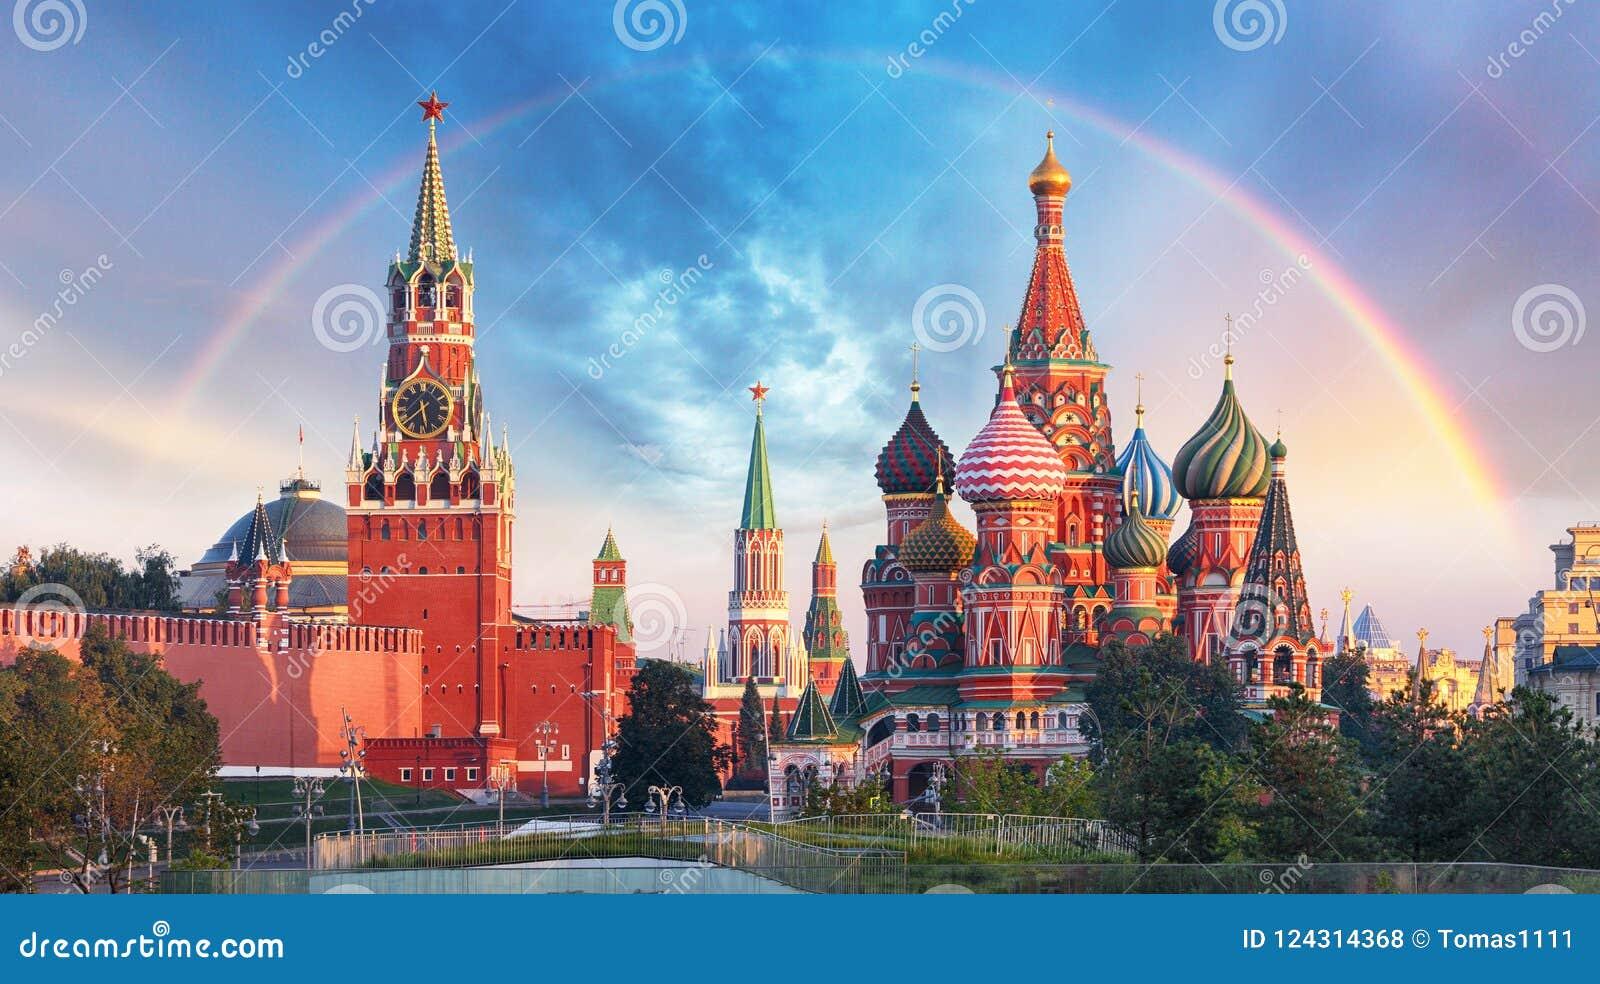 Moscú - vista panorámica de la Plaza Roja con Moscú el Kremlin